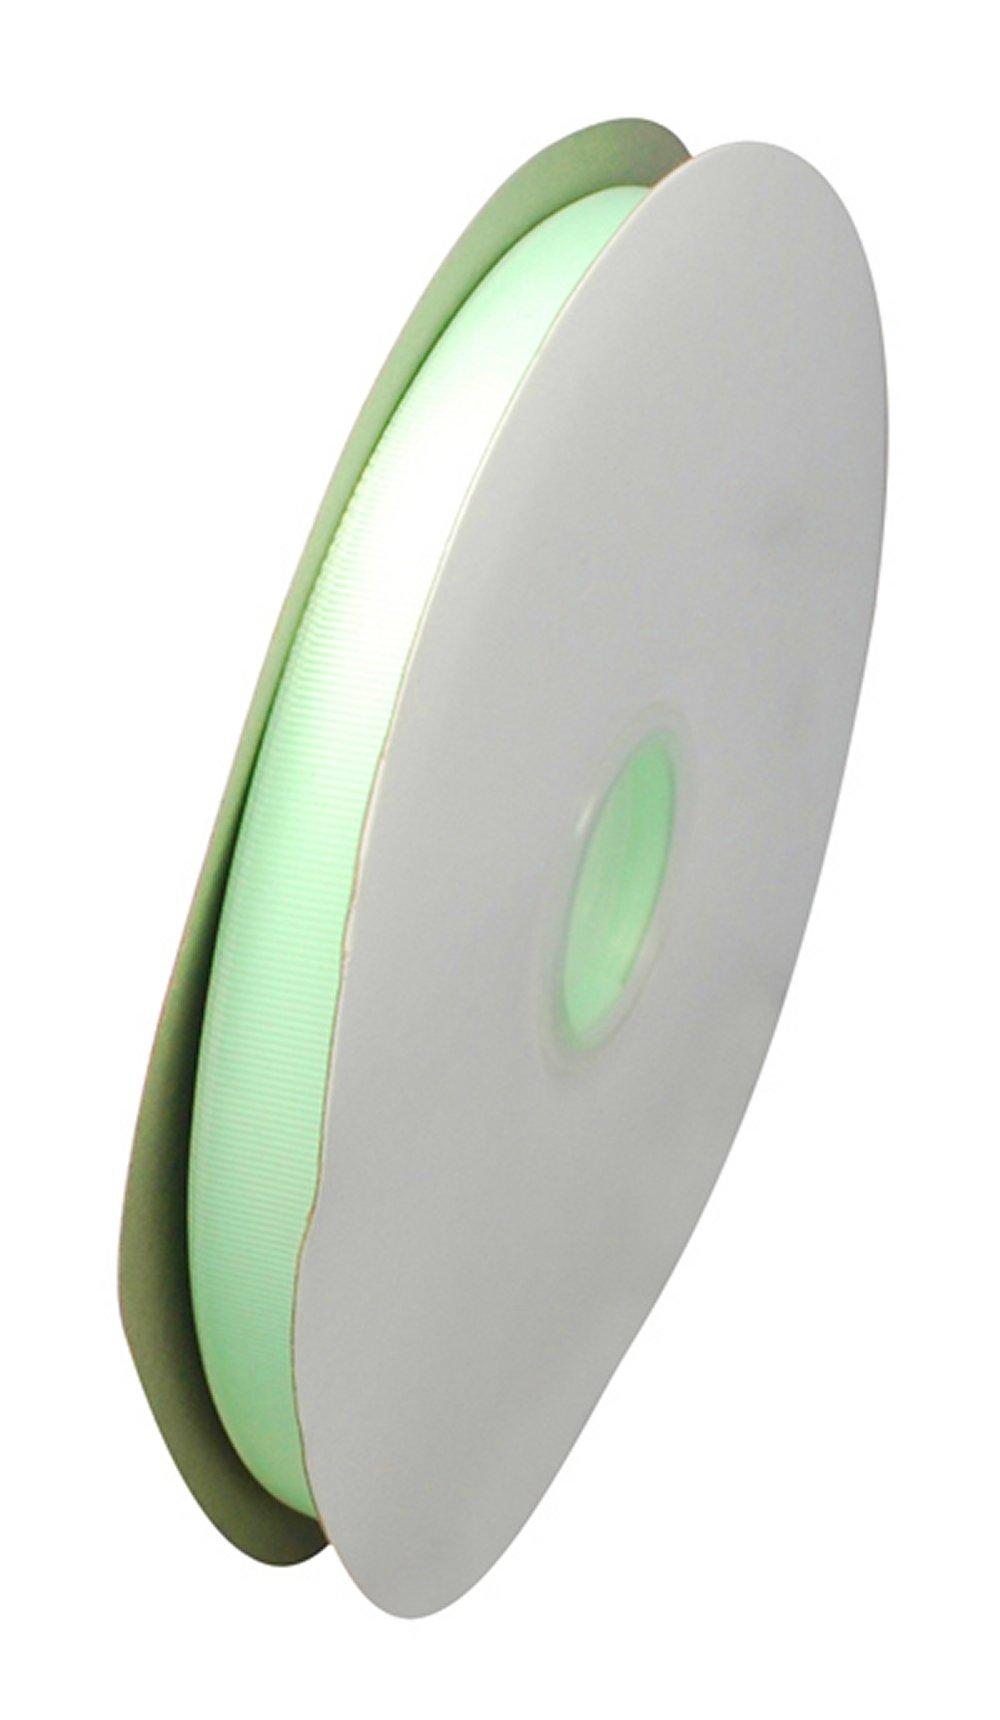 10mm PALE GREEN GROSGRAIN RIBBON